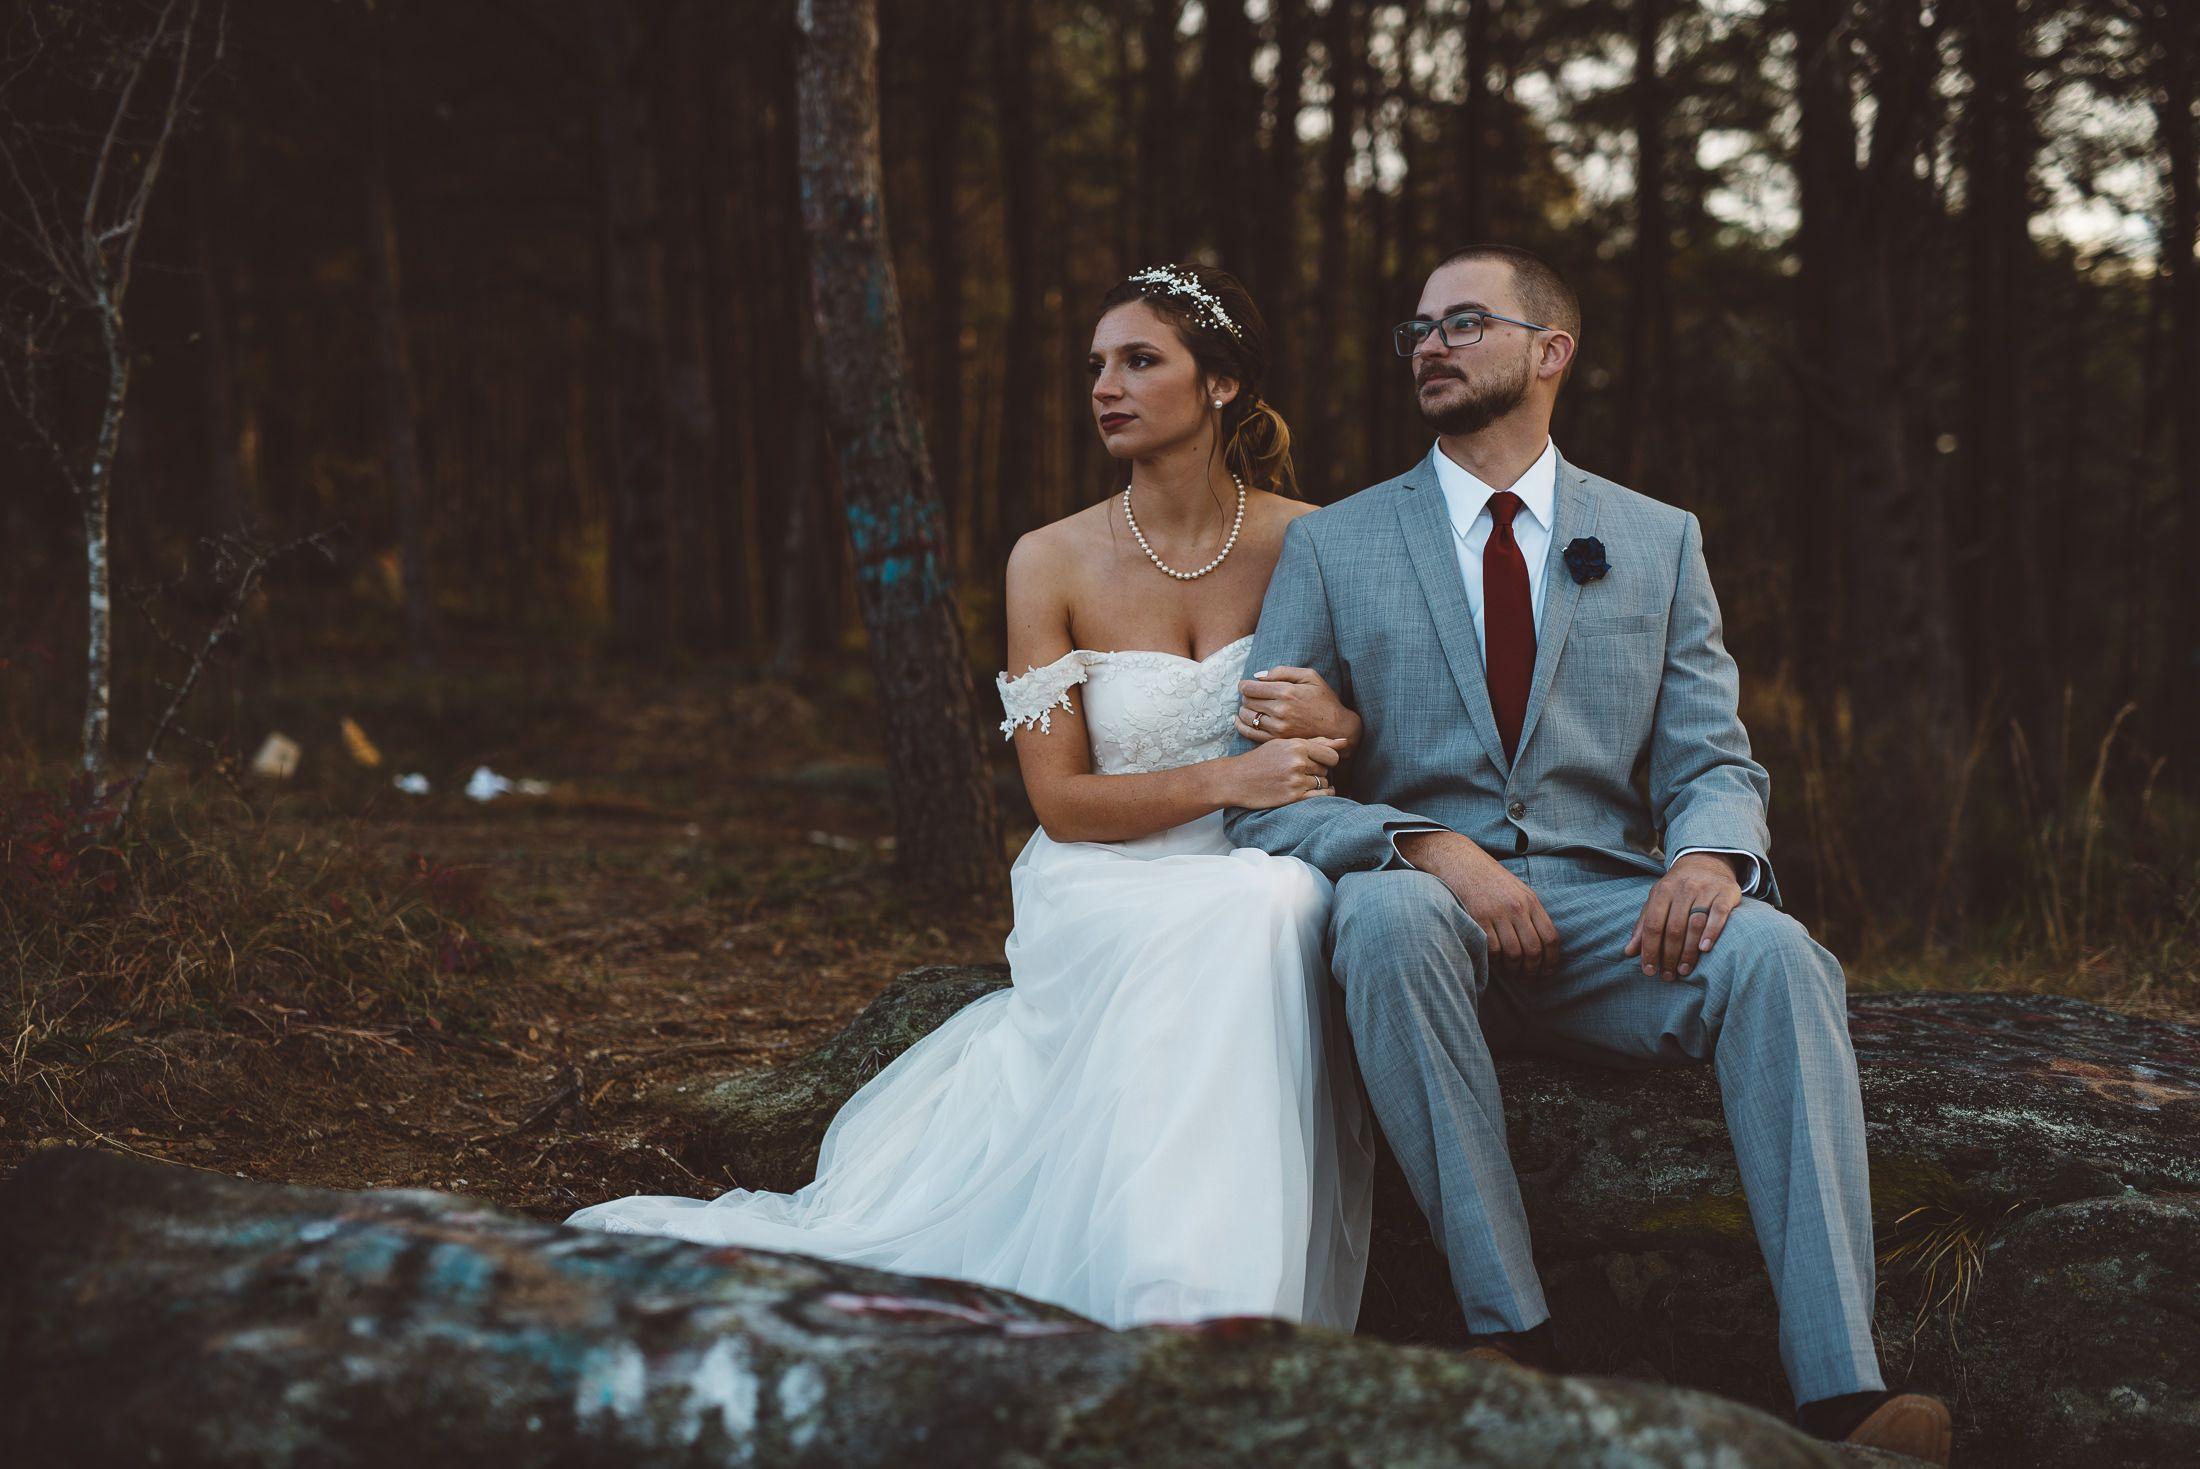 Rustic wedding, beautiful outdoor wedding venue, wedding ...